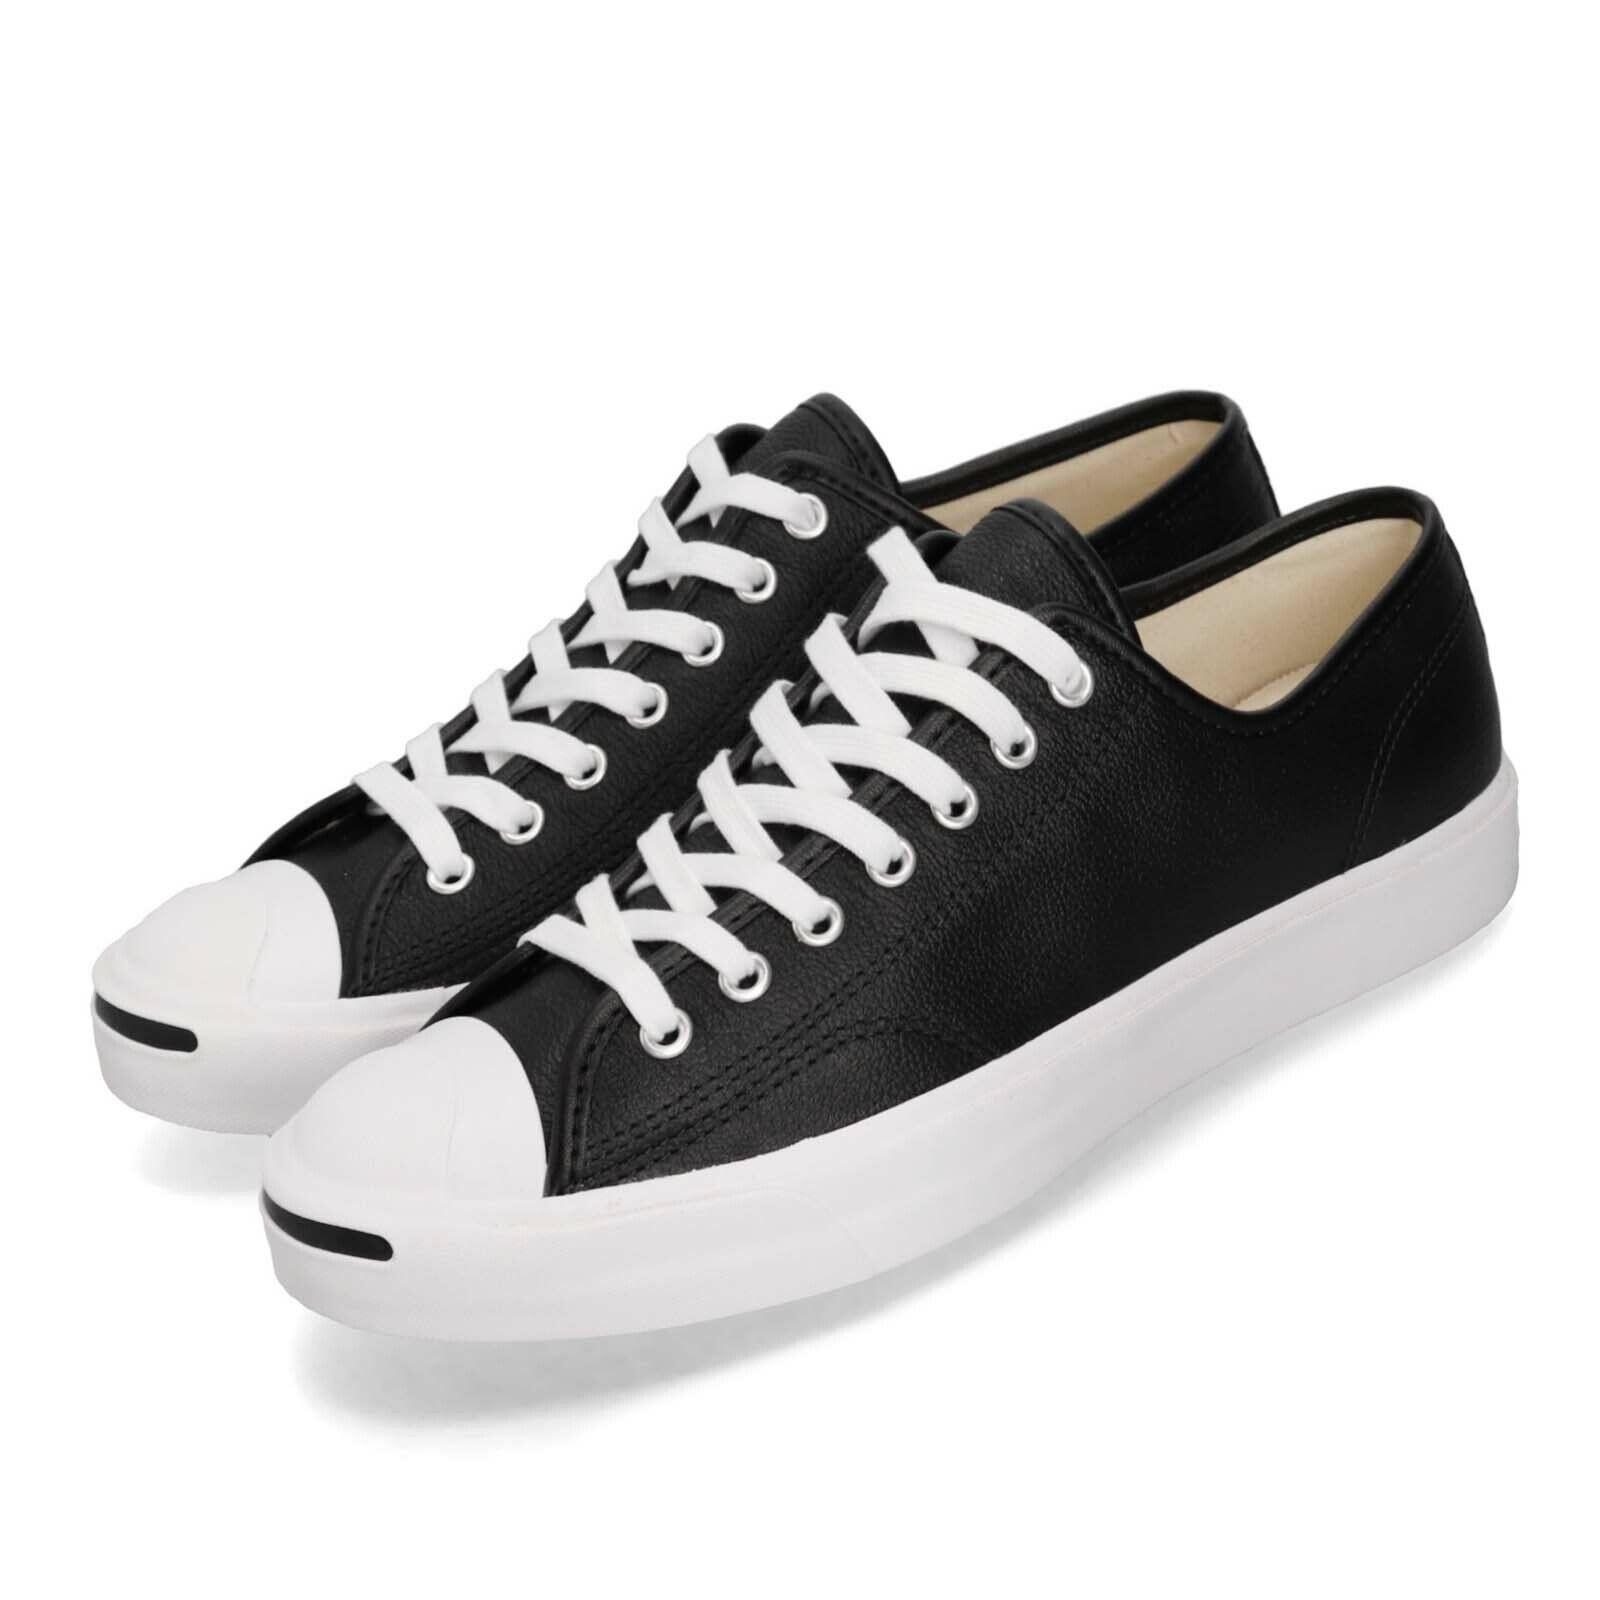 Converse Jack Purcell OX Black White Men Women Unisex Casual Shoes 164224C